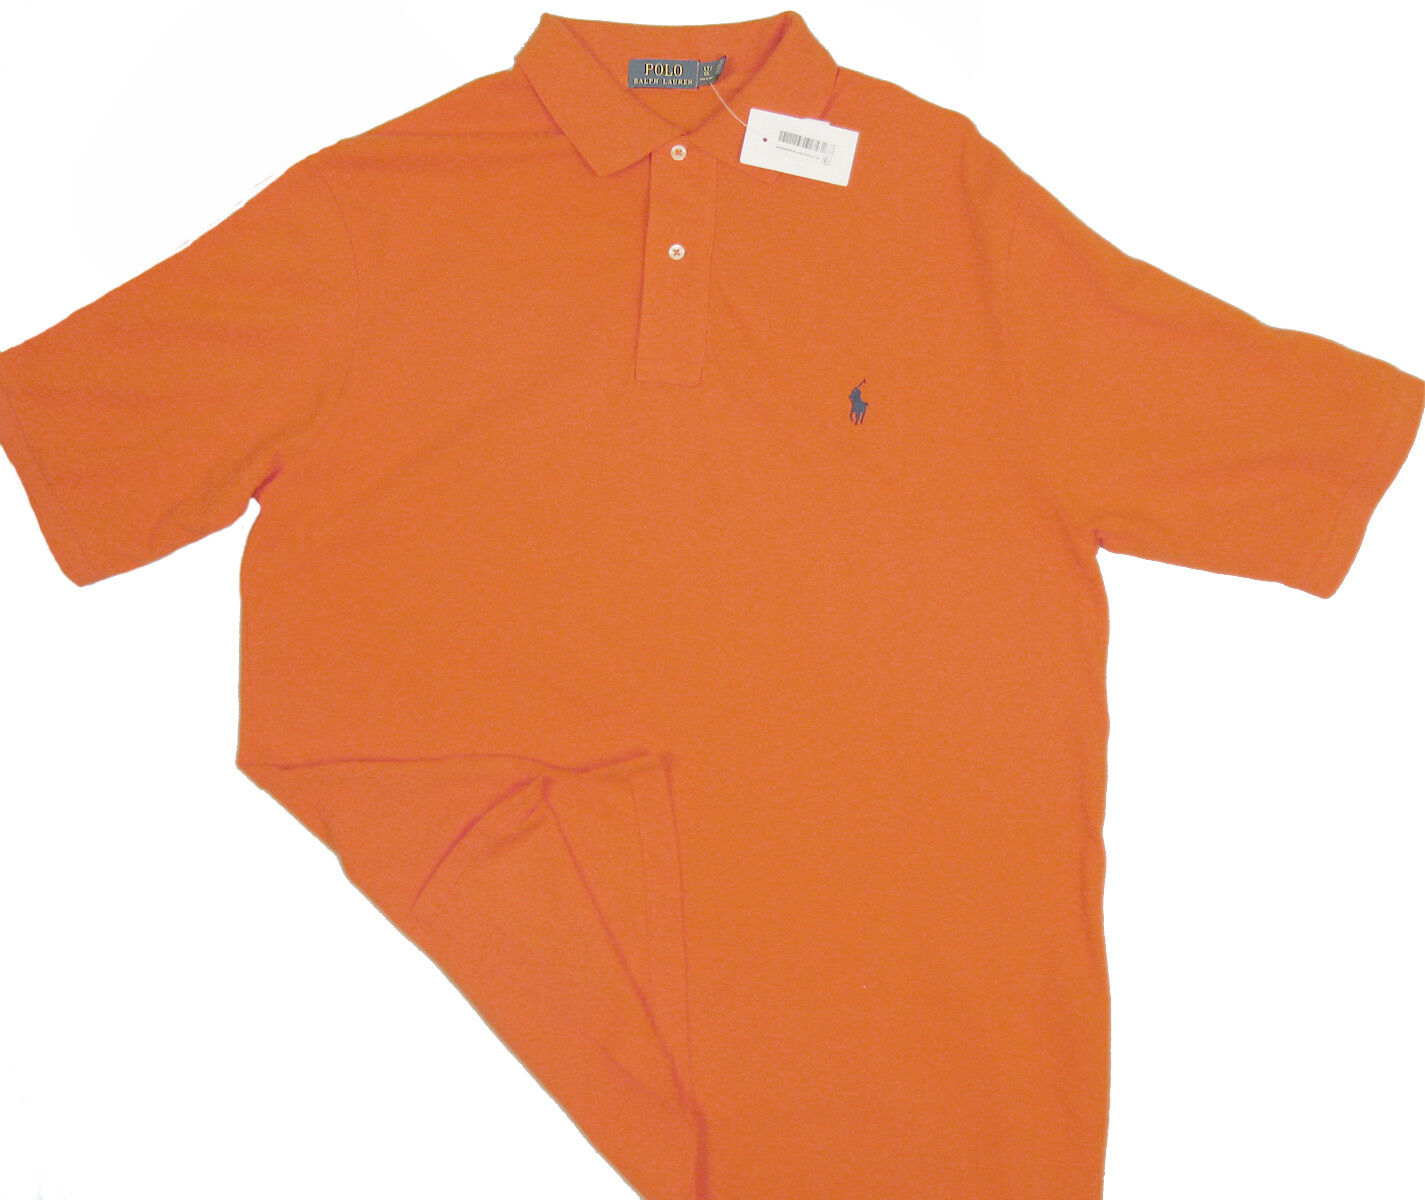 463f45978 NEW Polo Ralph Lauren Big   Tall Polo Shirt LT Tall orange Mesh Fabric